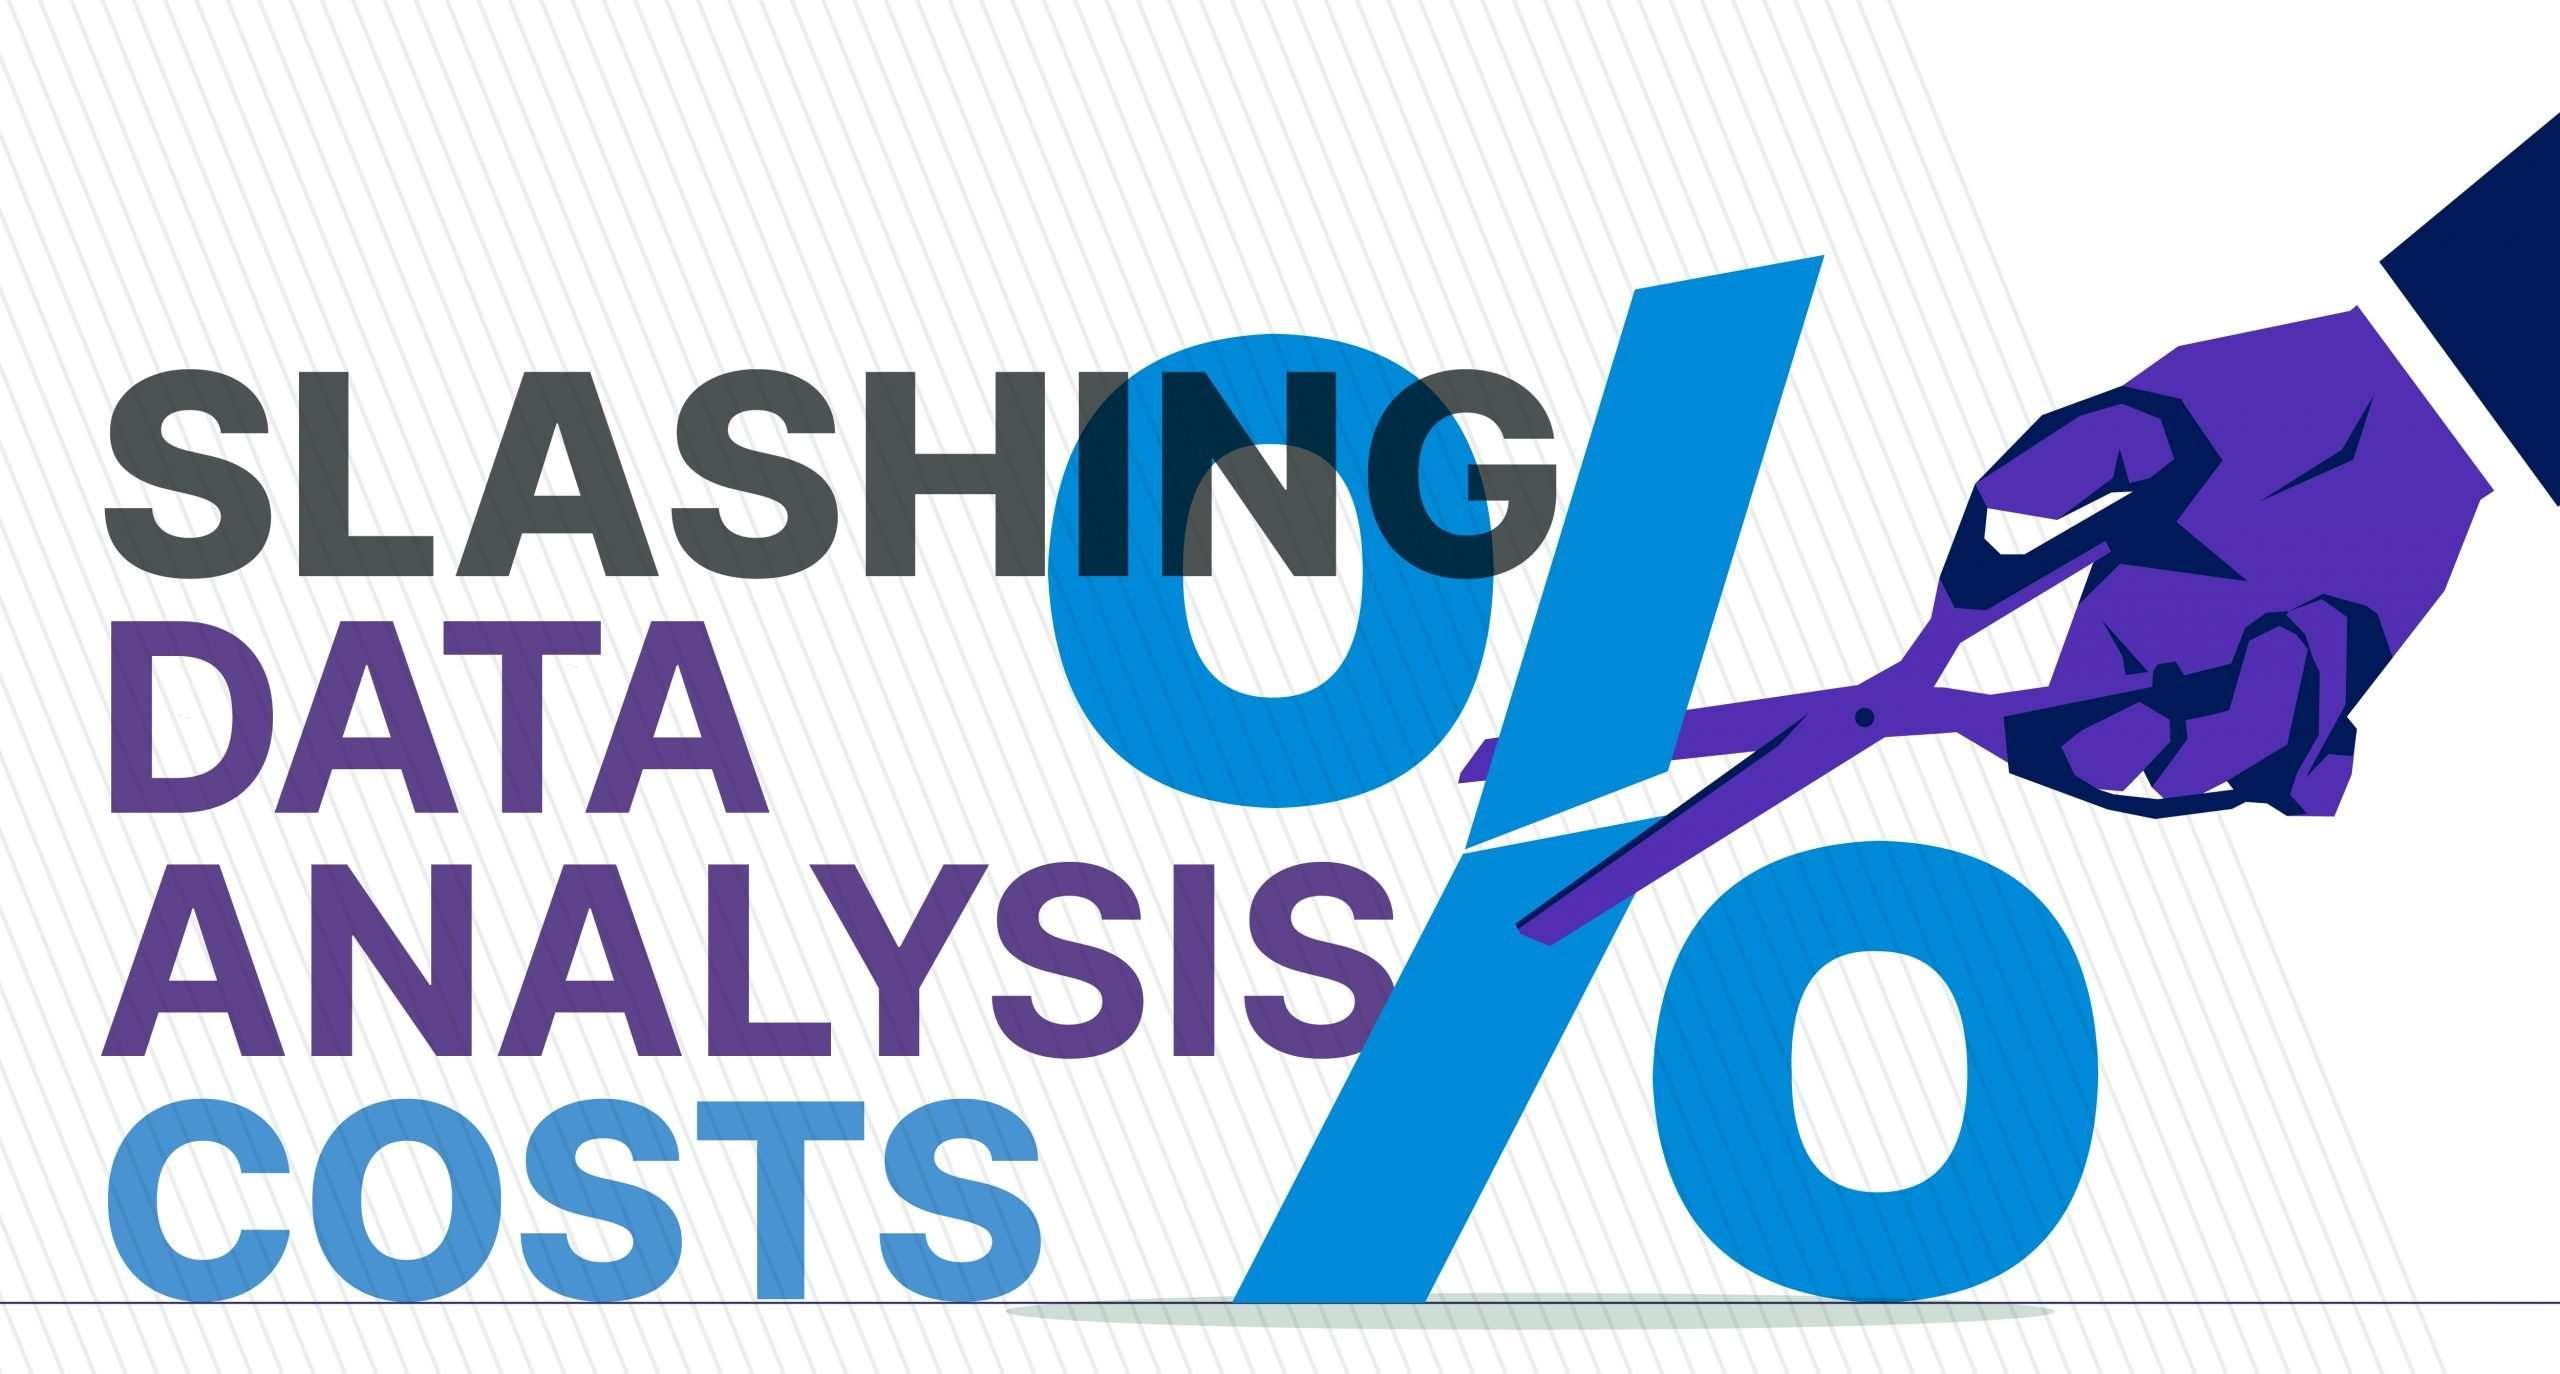 Slashing data analysis costs by reducing data